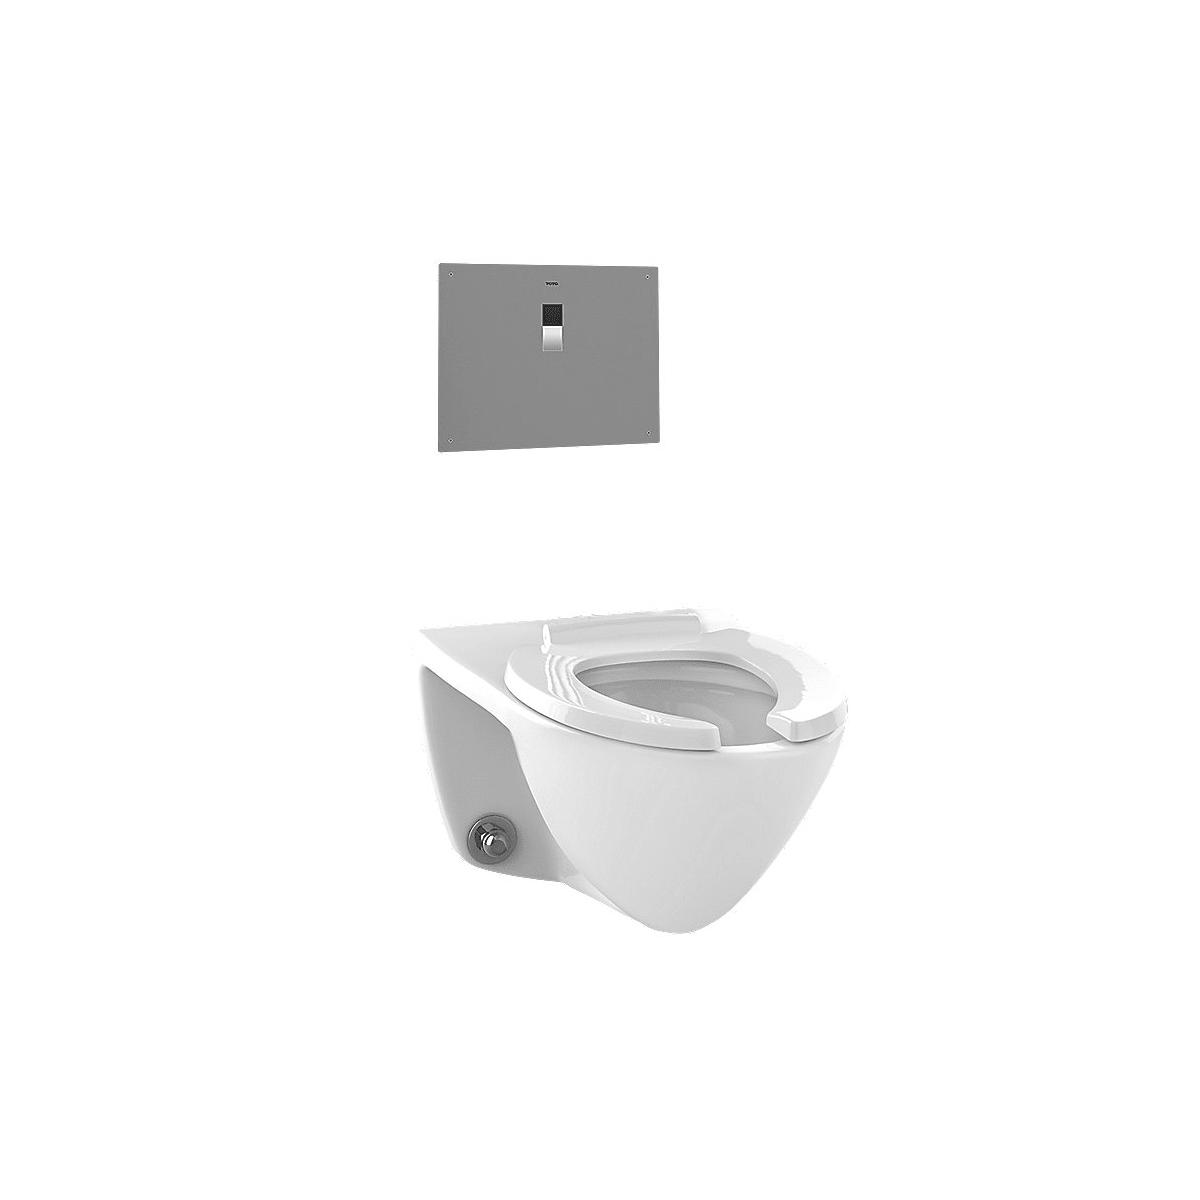 Toto CT708EV#03 Bone Flushometer Elongated 1.28 GPF Toilet Bowl Only ...